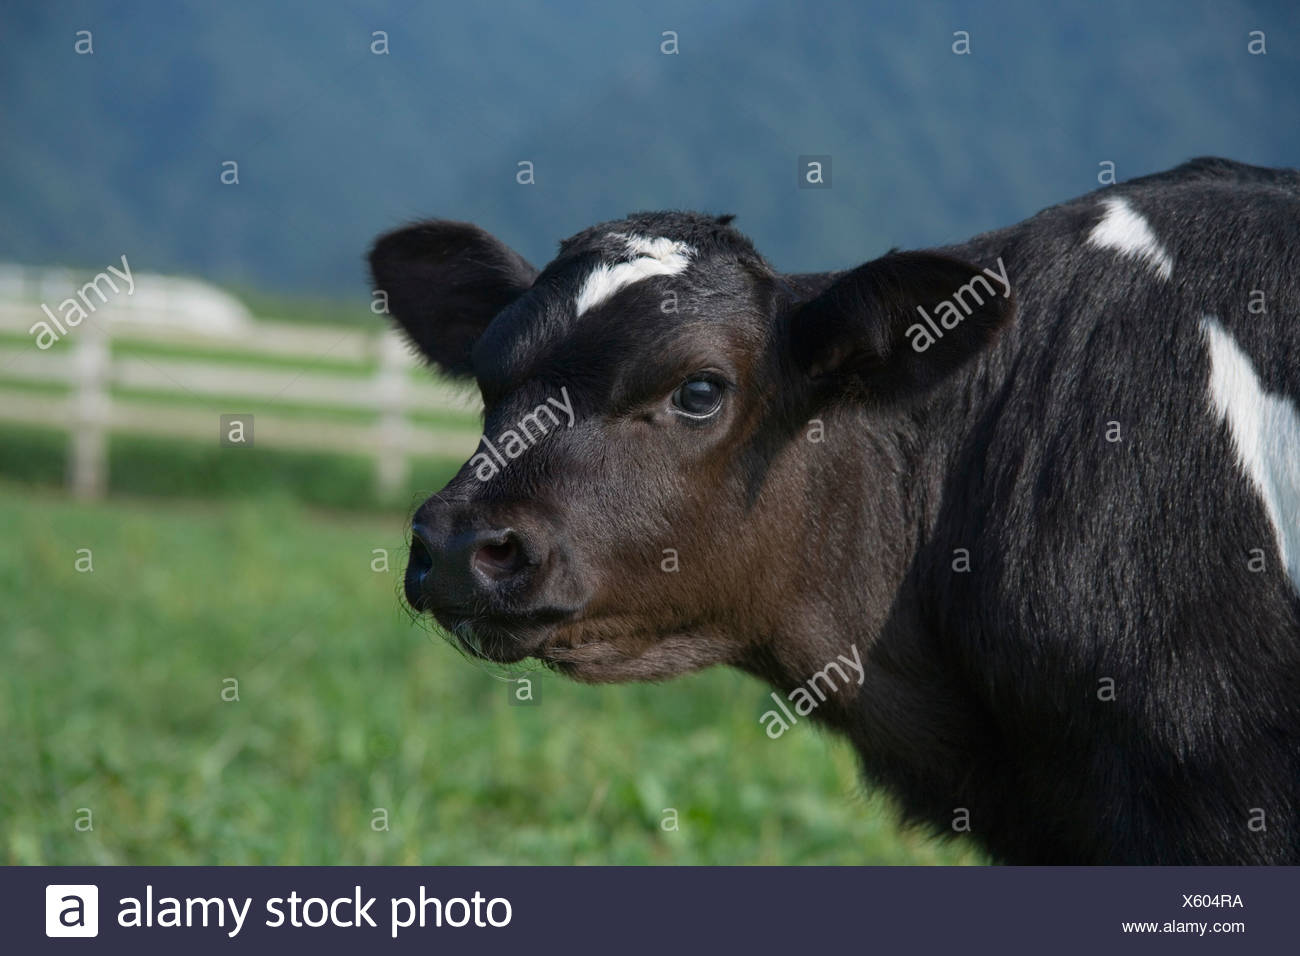 Mucca in piedi in fattoria Immagini Stock